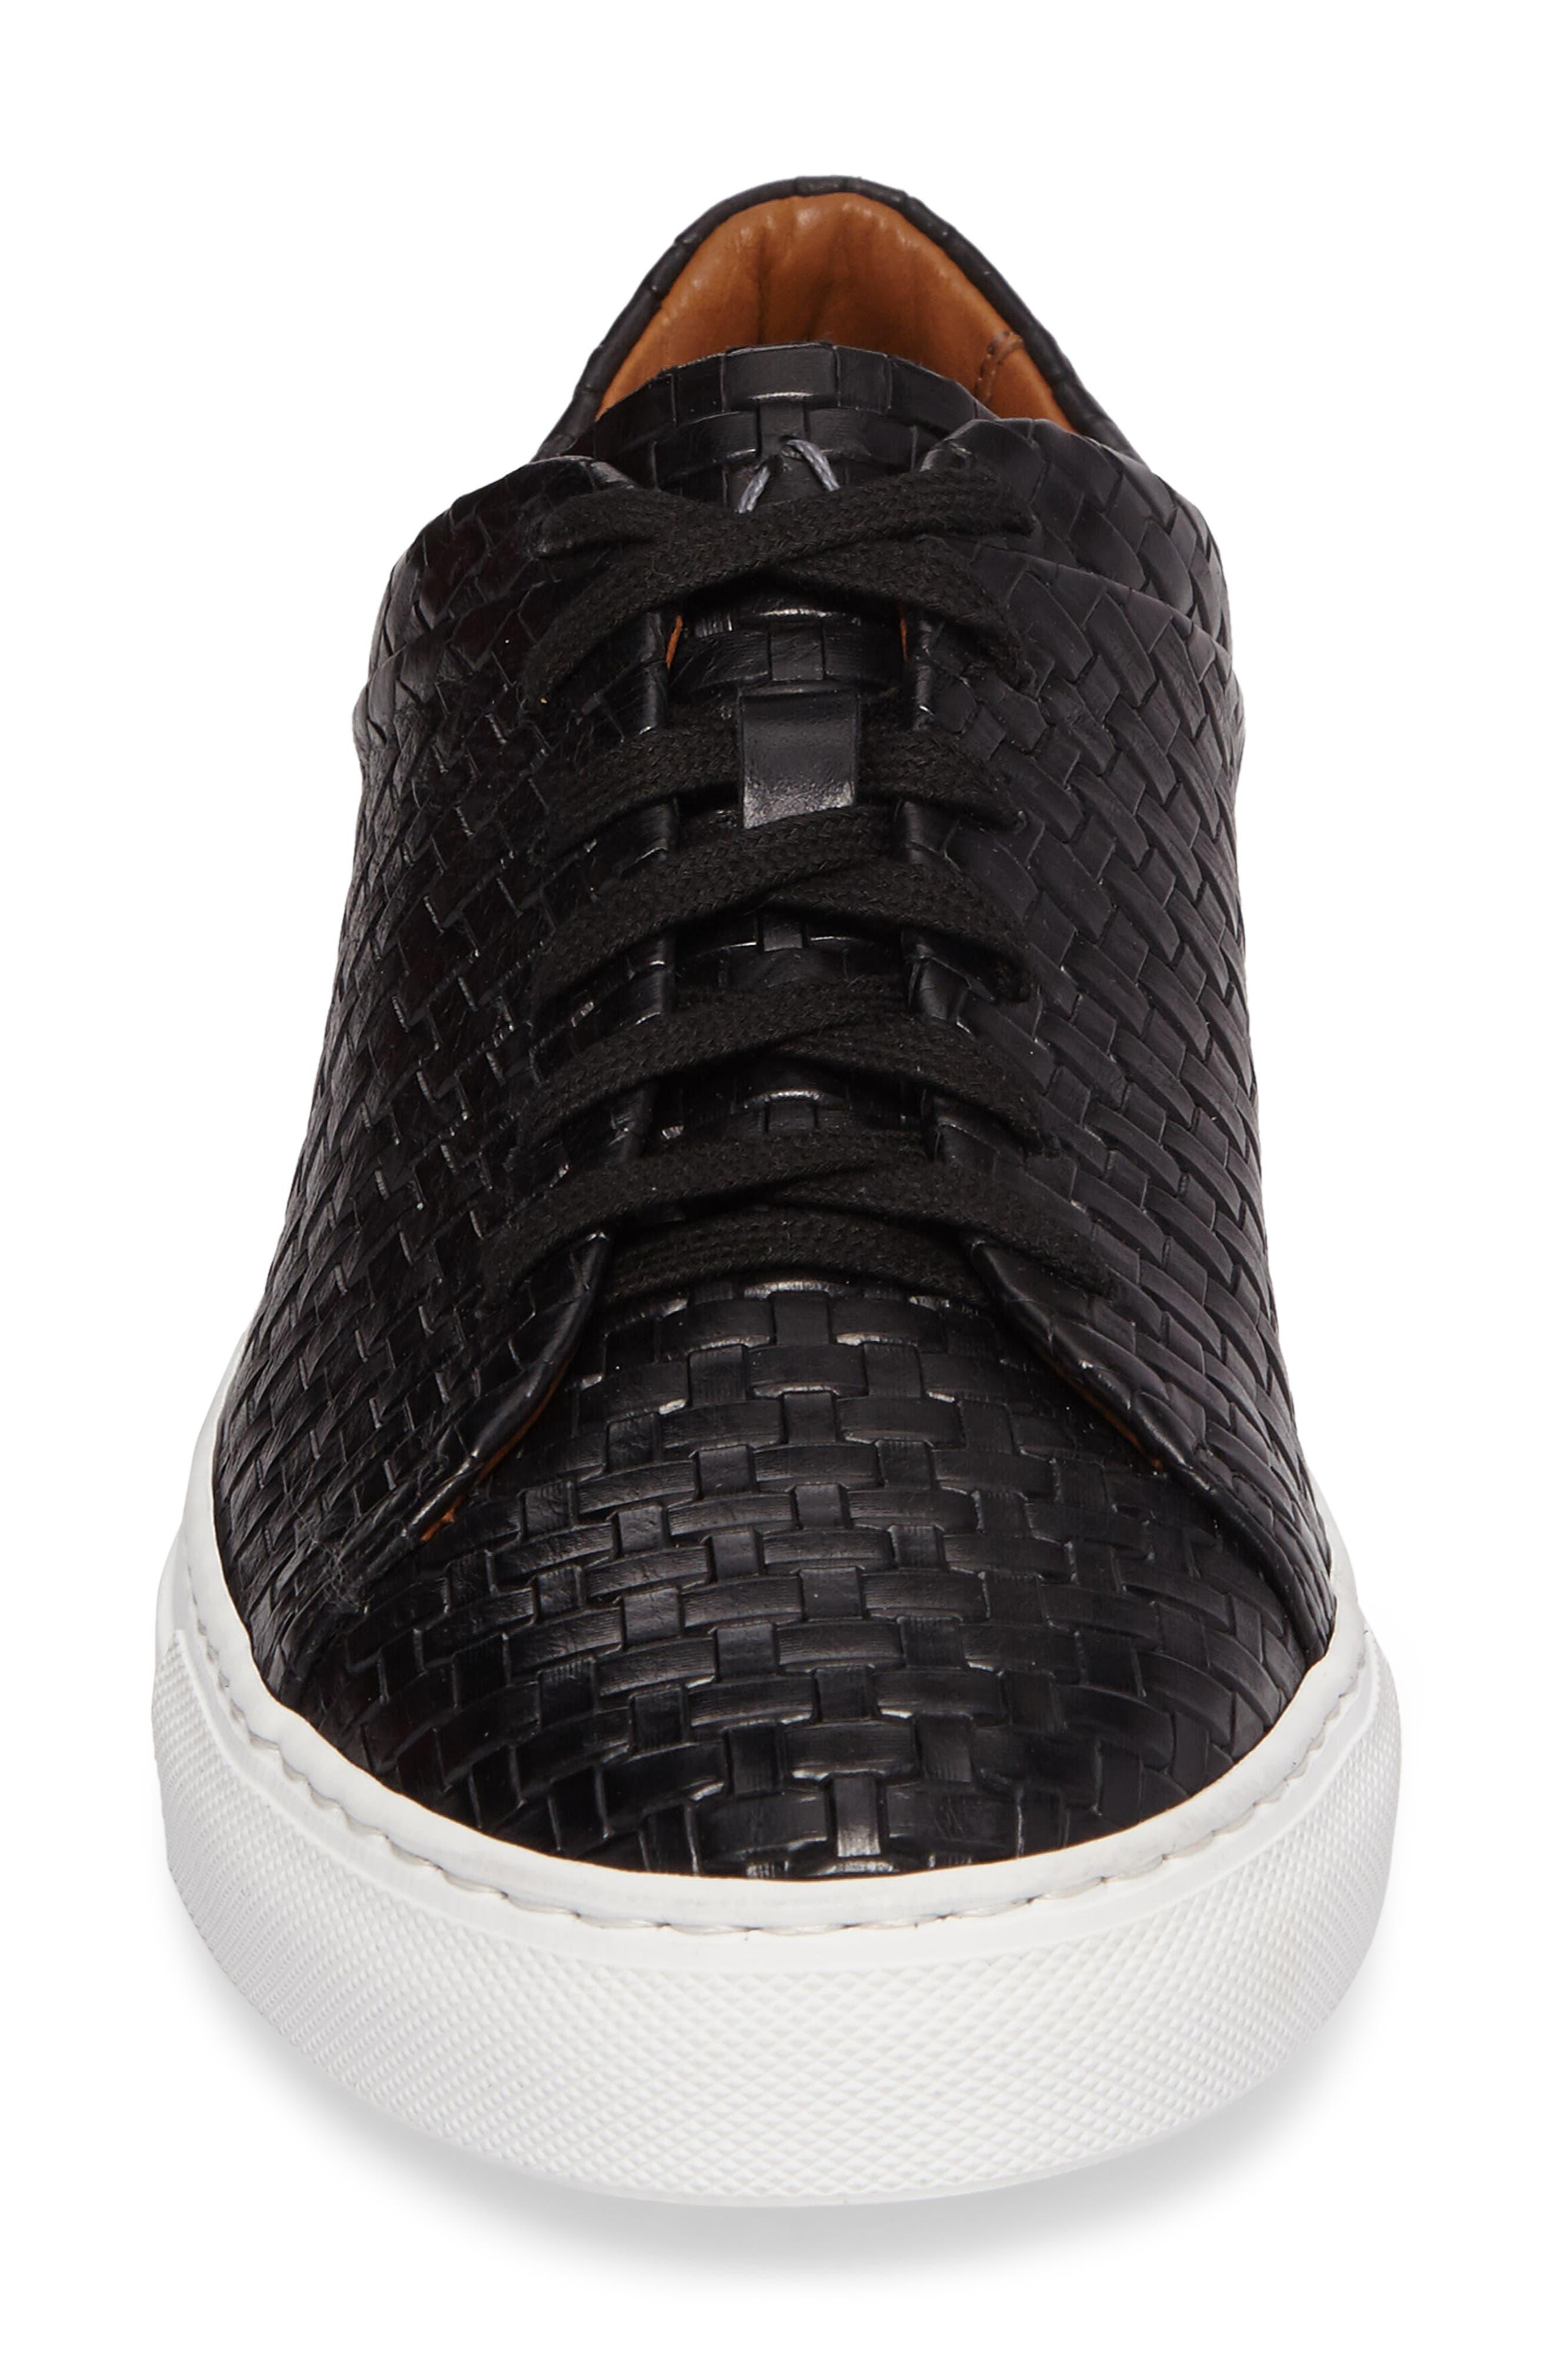 Avery Weatherproof Sneaker,                             Alternate thumbnail 4, color,                             Black